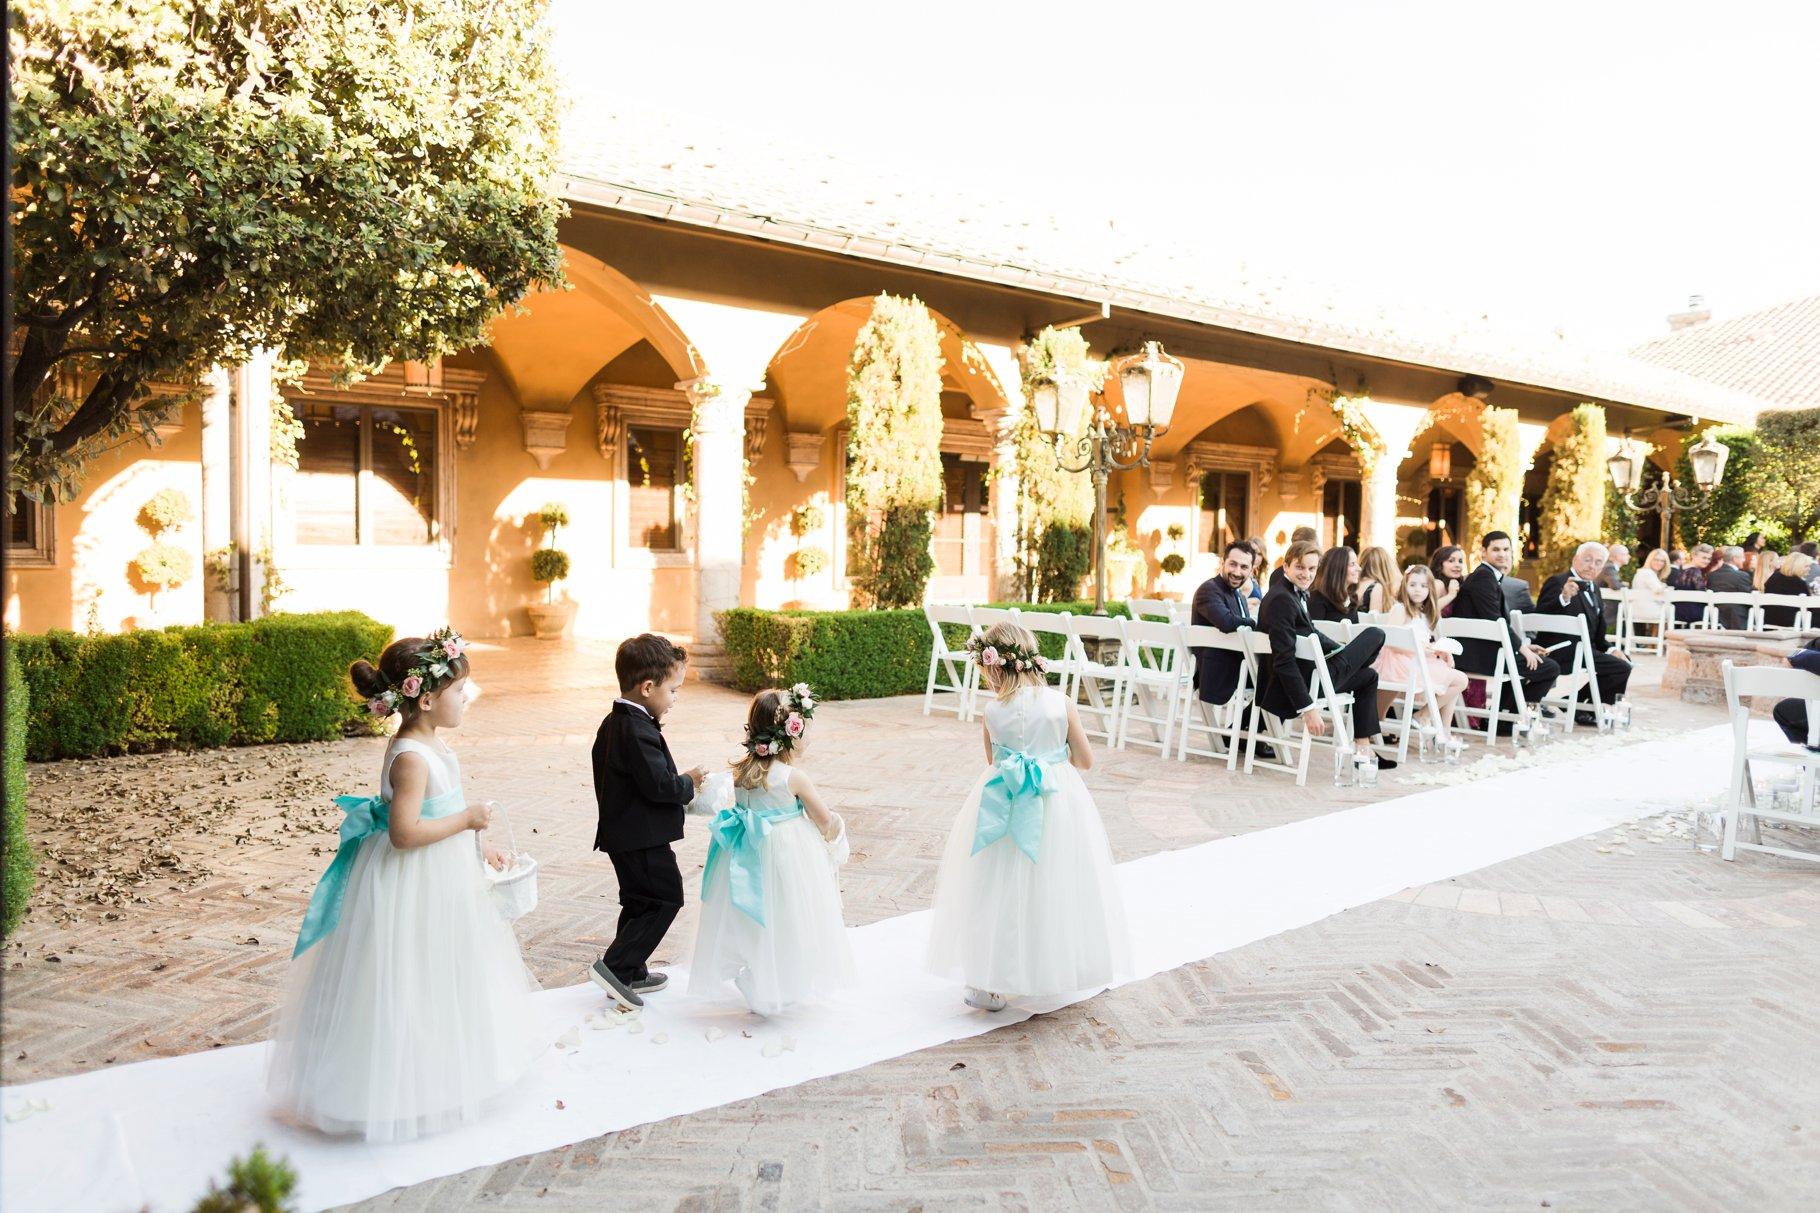 villa siena wedding-064_GRETCHEN WAKEMAN PHOTOGRAPHY.jpg